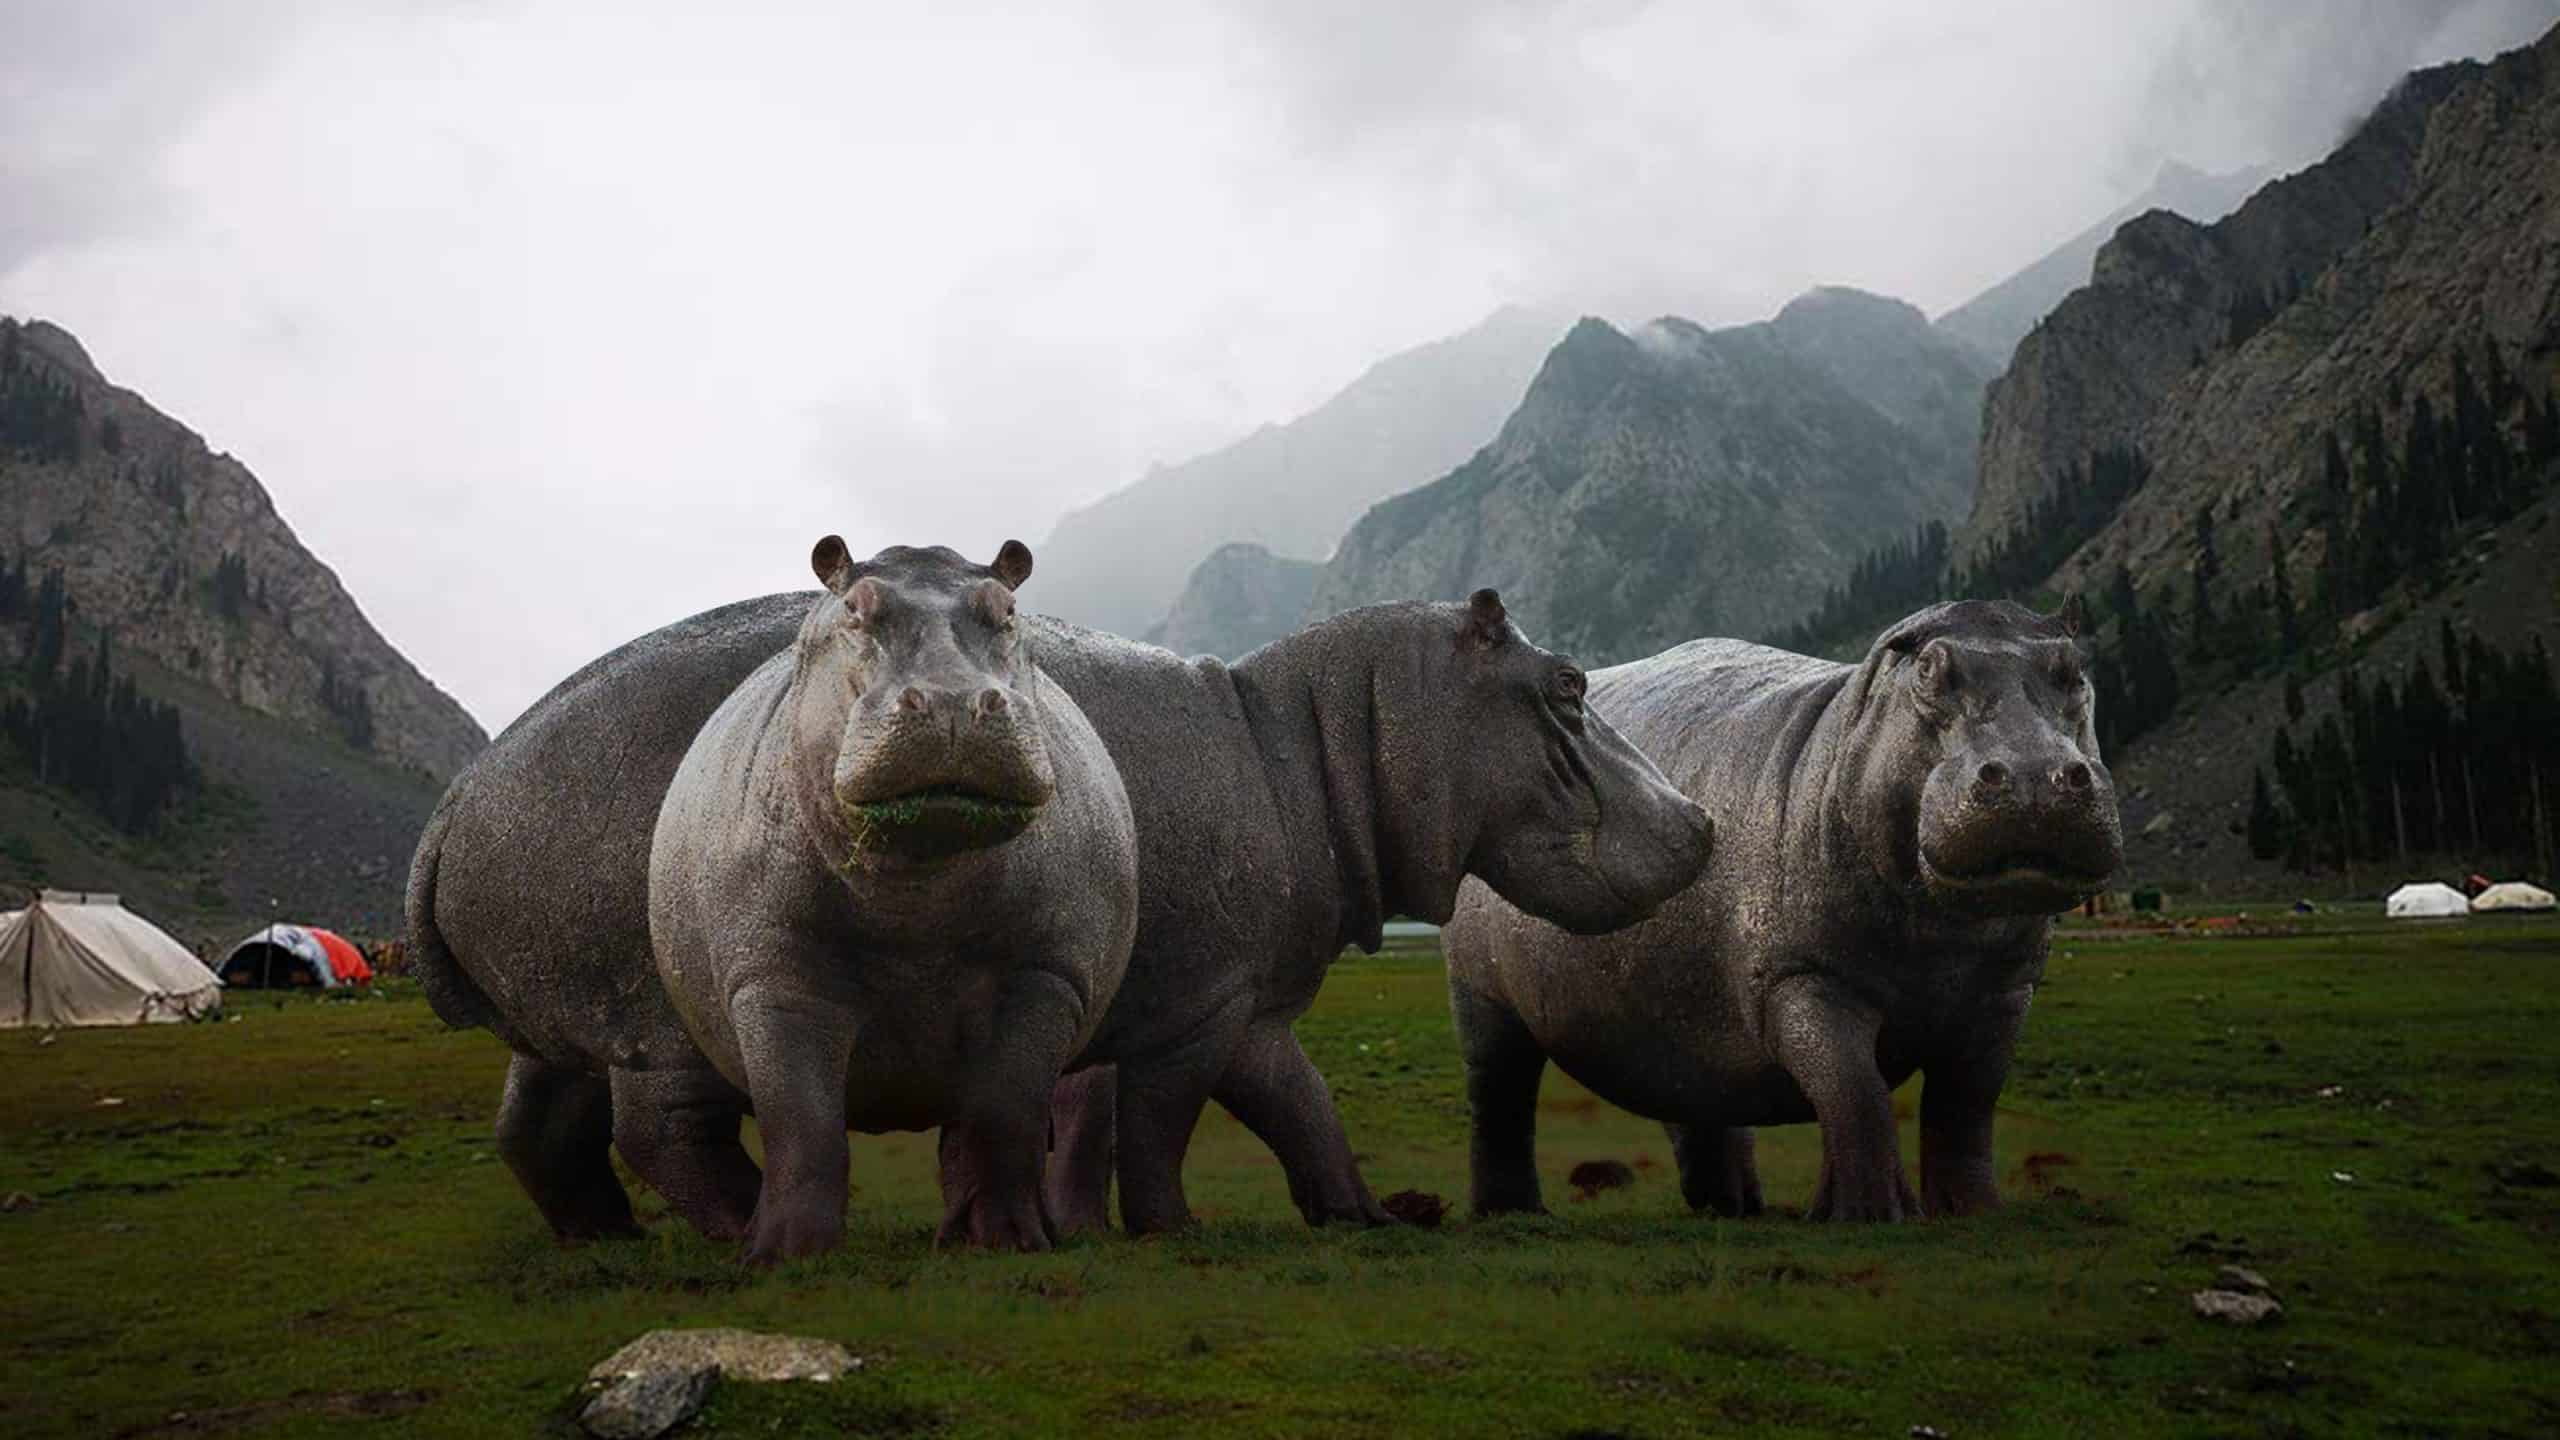 200615 - Hippos - Linkedin